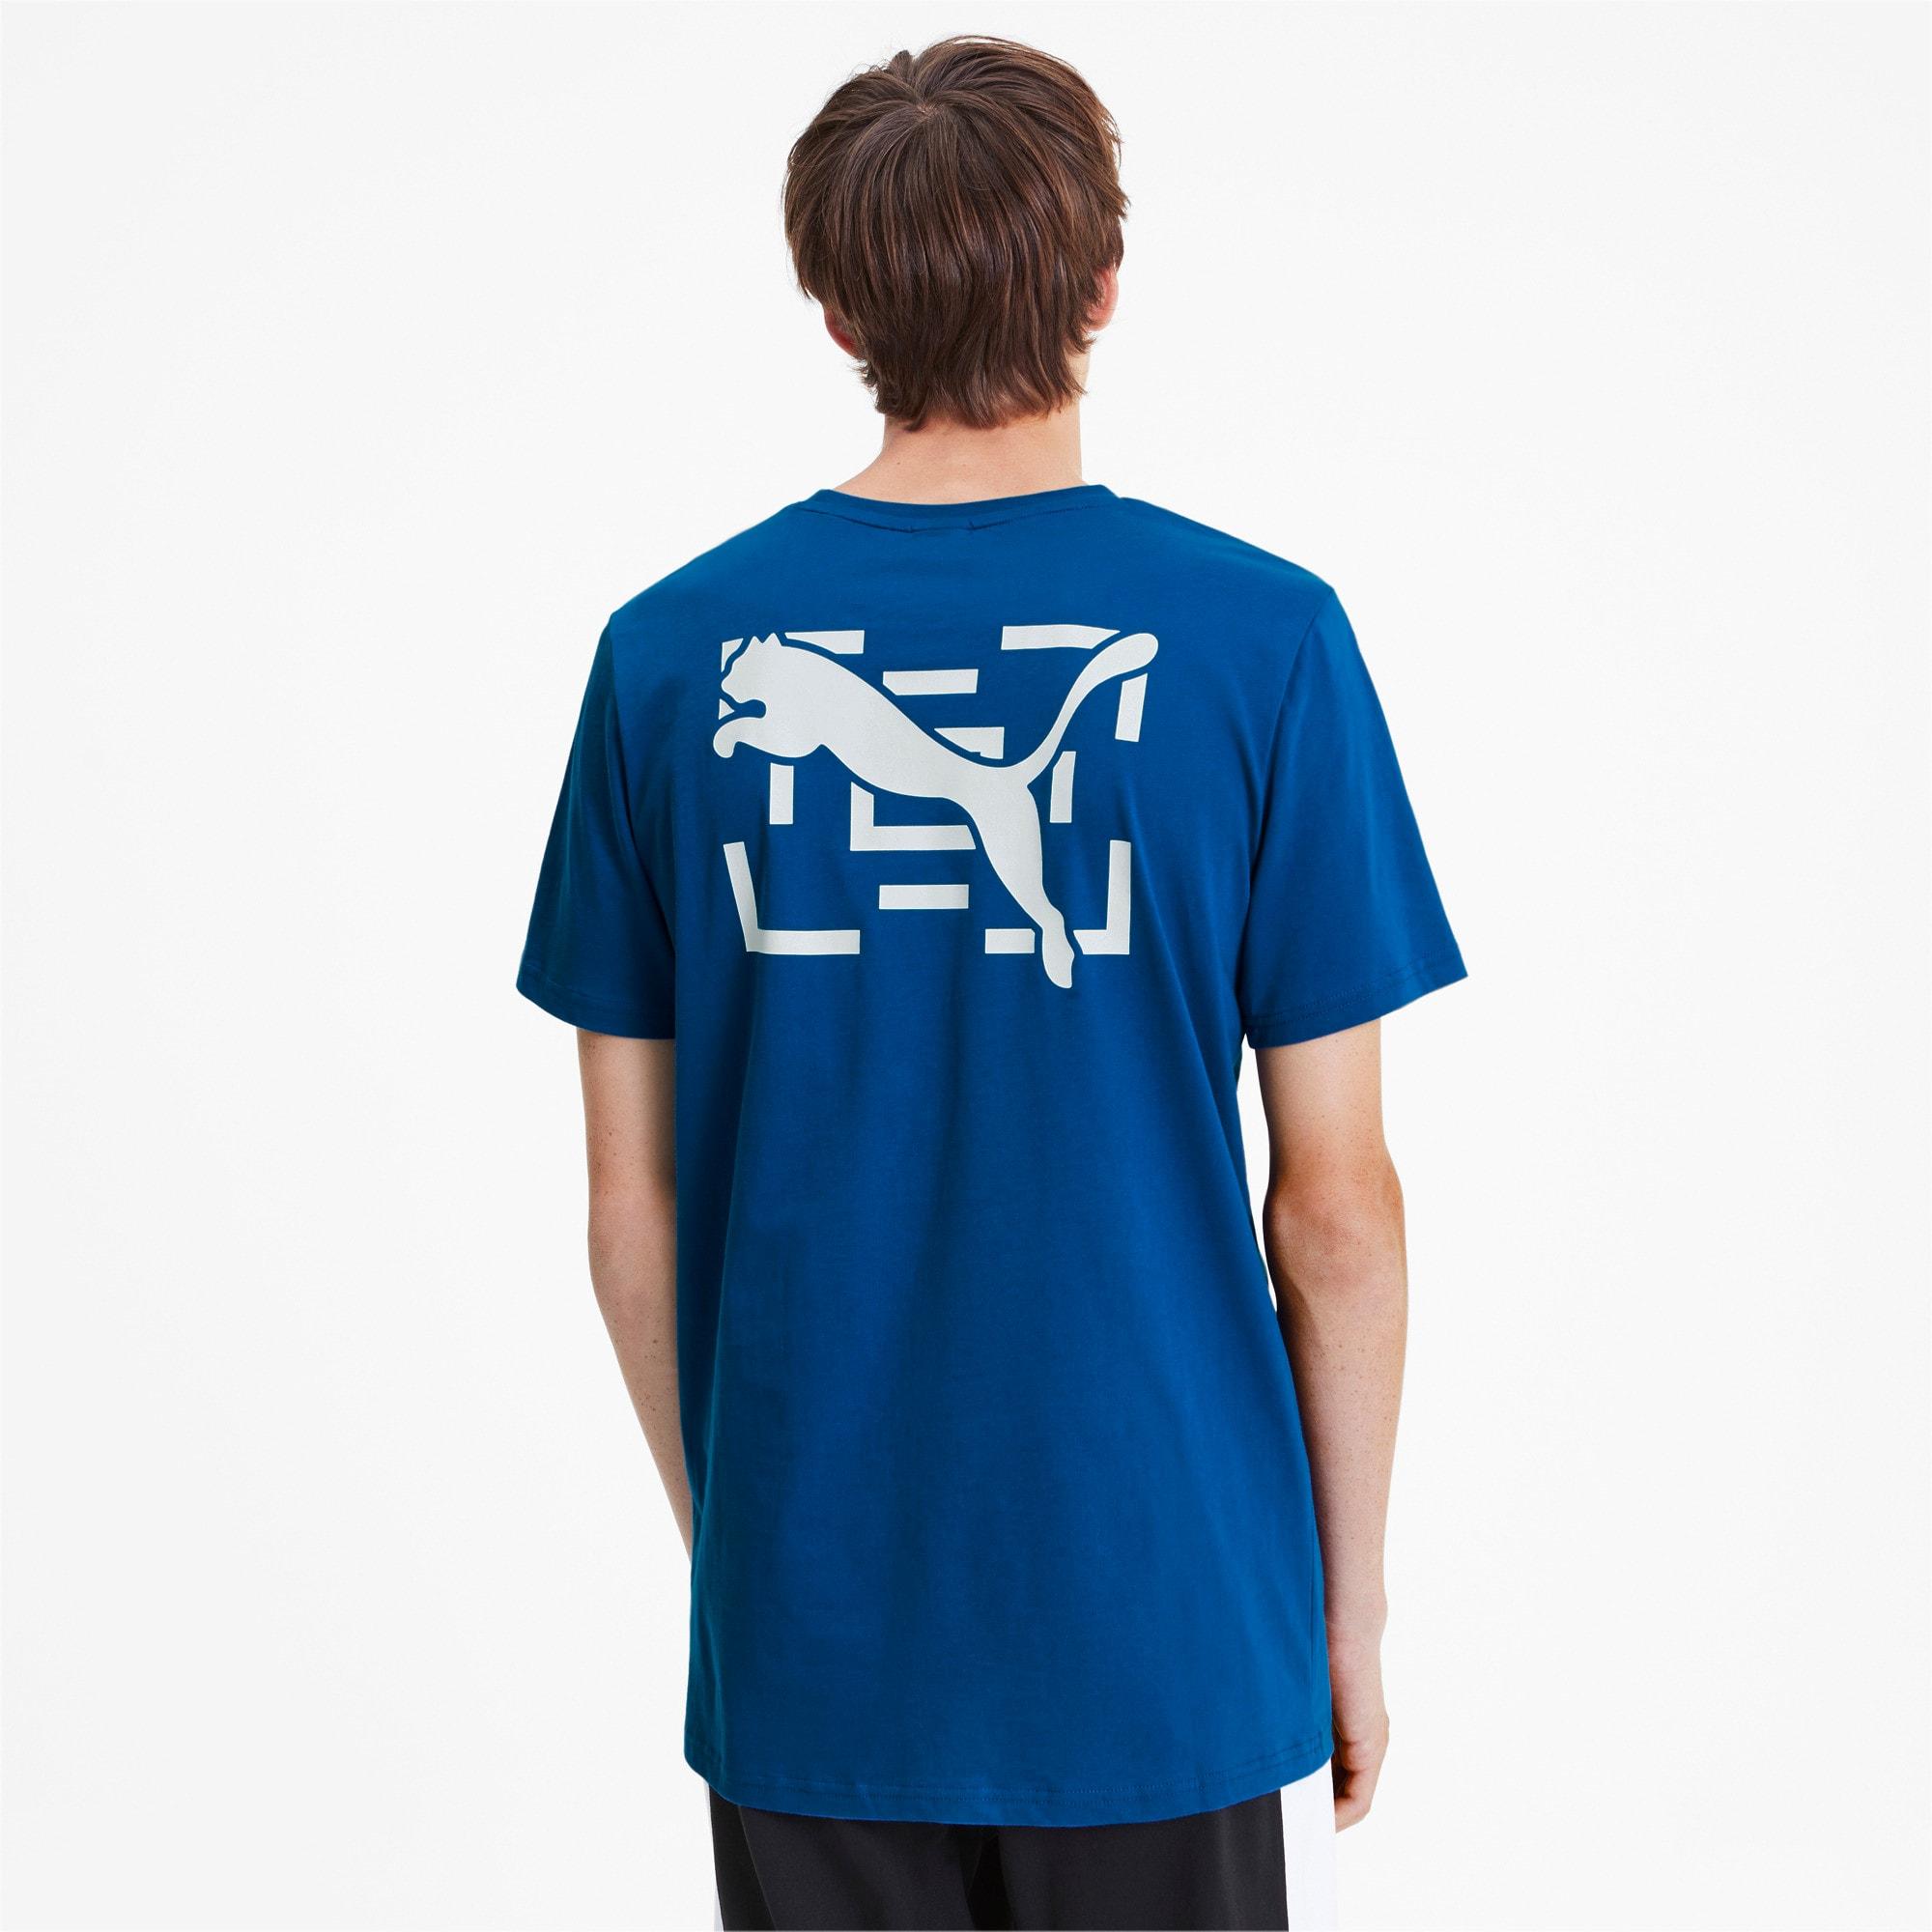 Thumbnail 2 of PUMA x LES BENJAMINS Tシャツ, Galaxy Blue, medium-JPN